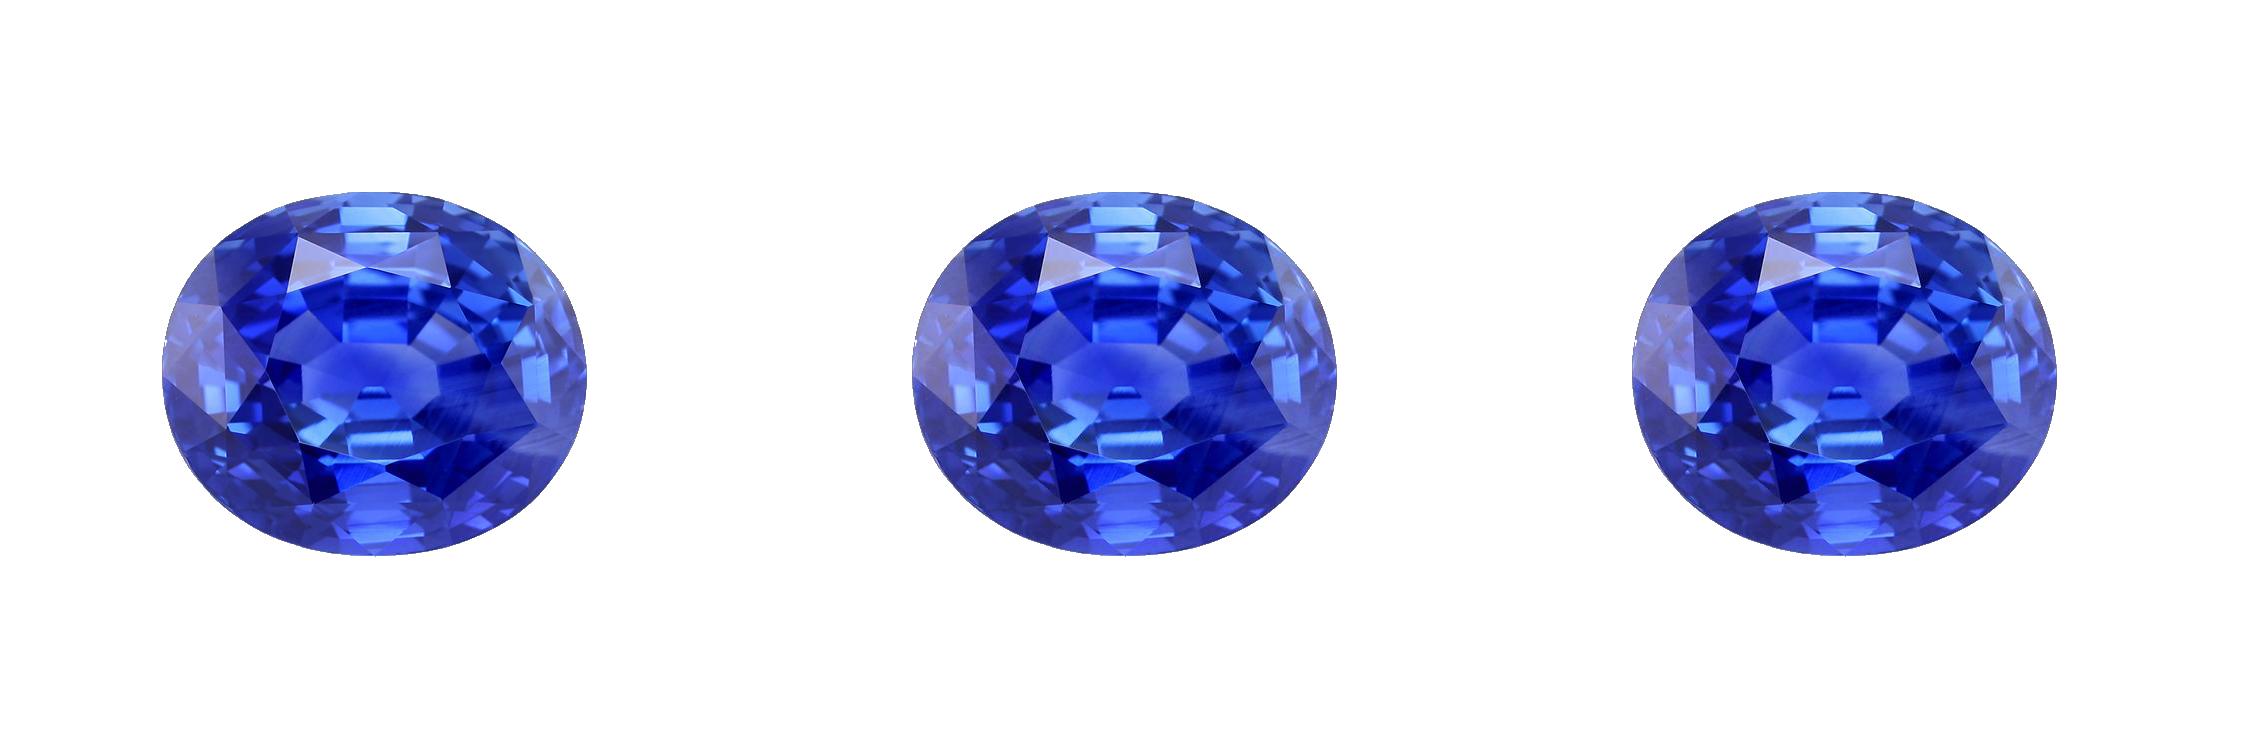 Sapphire Stone PNG Transparent Images.